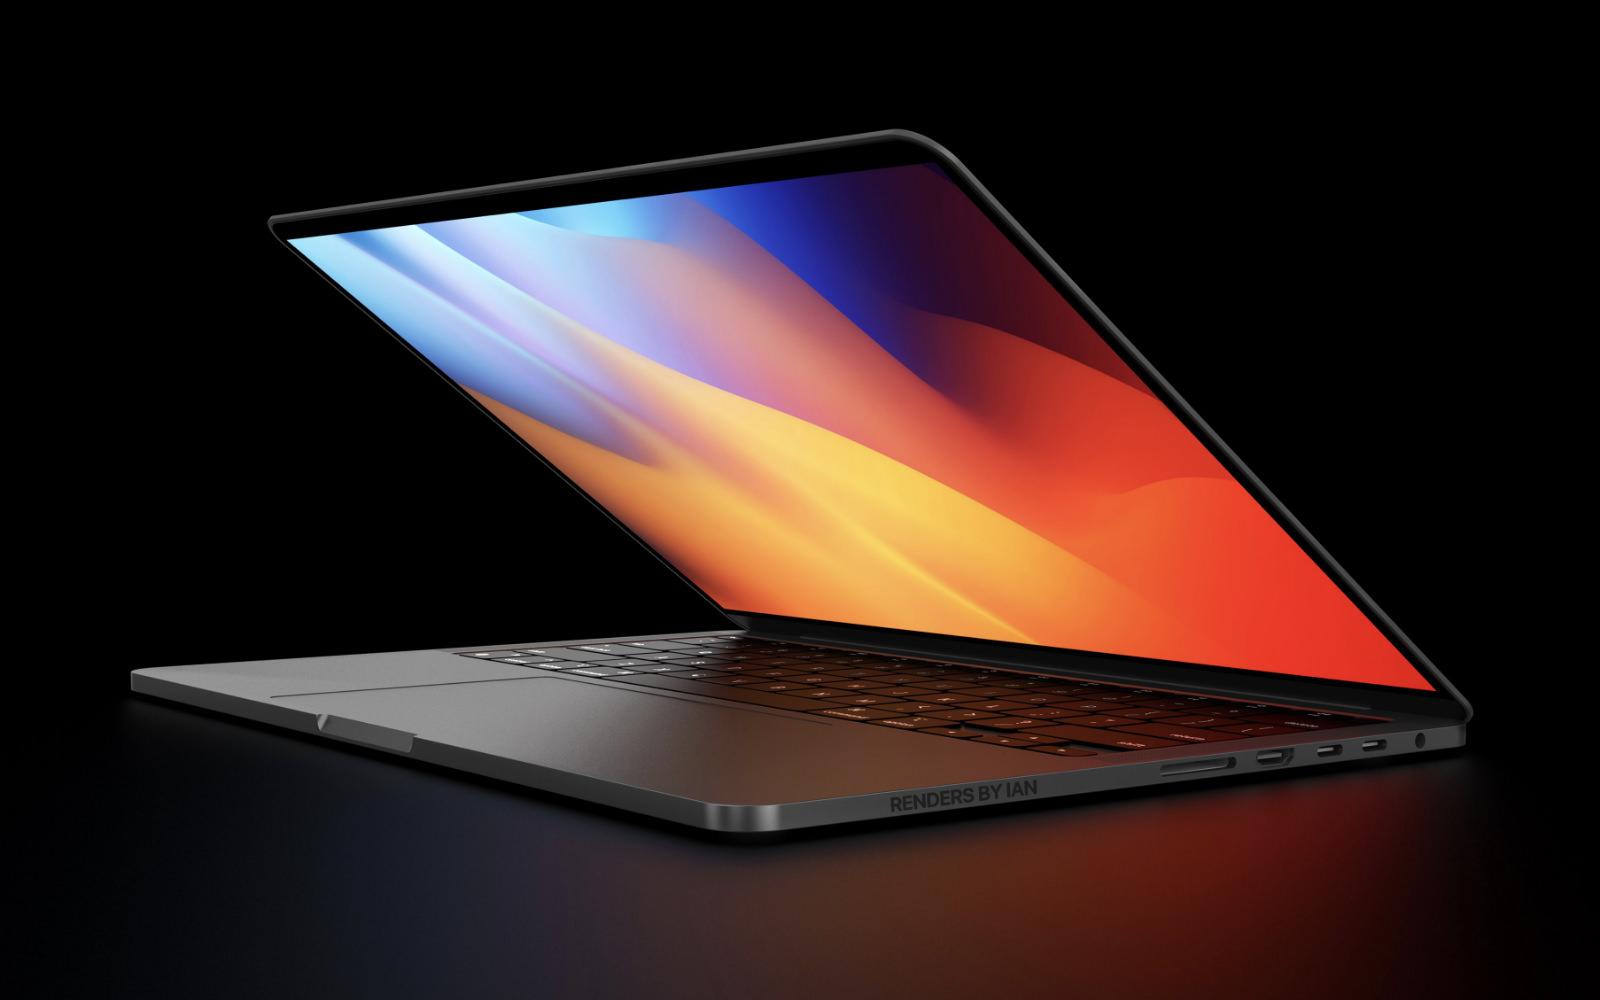 MacBookPro 14inch rendersbyian